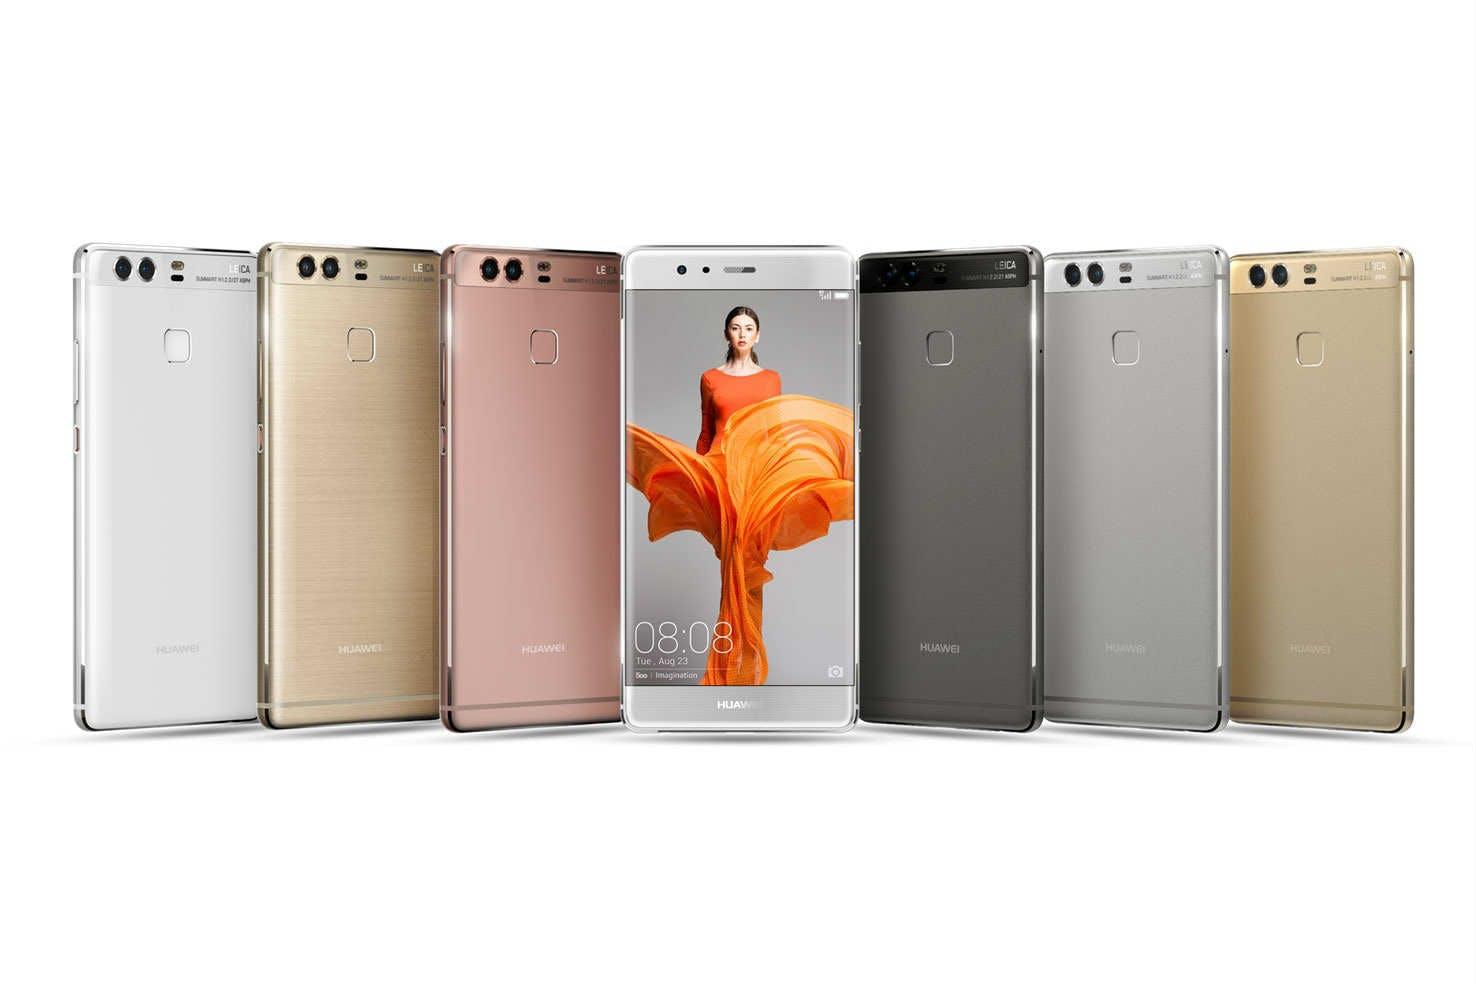 Arquivo de Huawei - Colombo 1ed05e371f